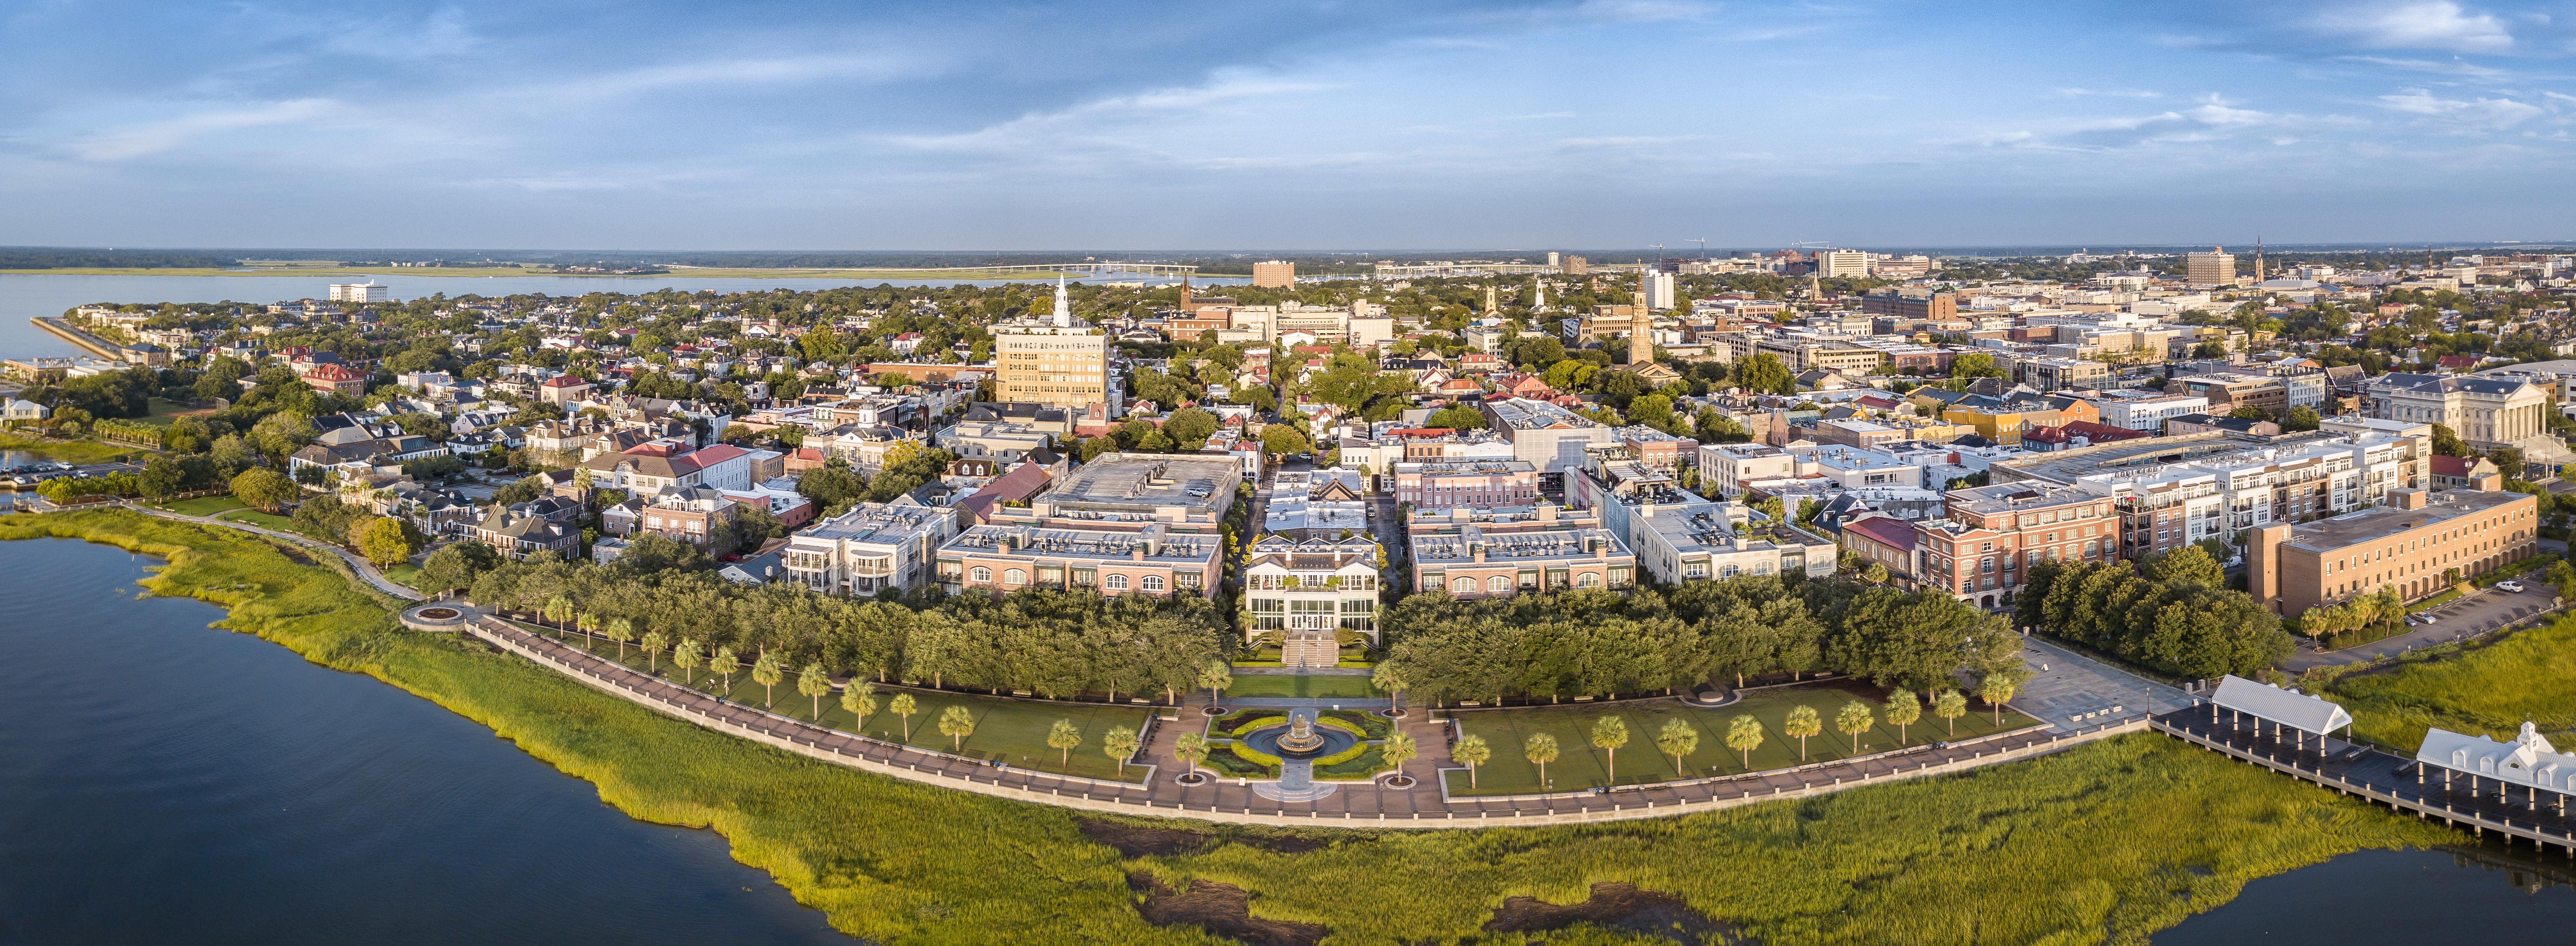 Charleston, SC 2022